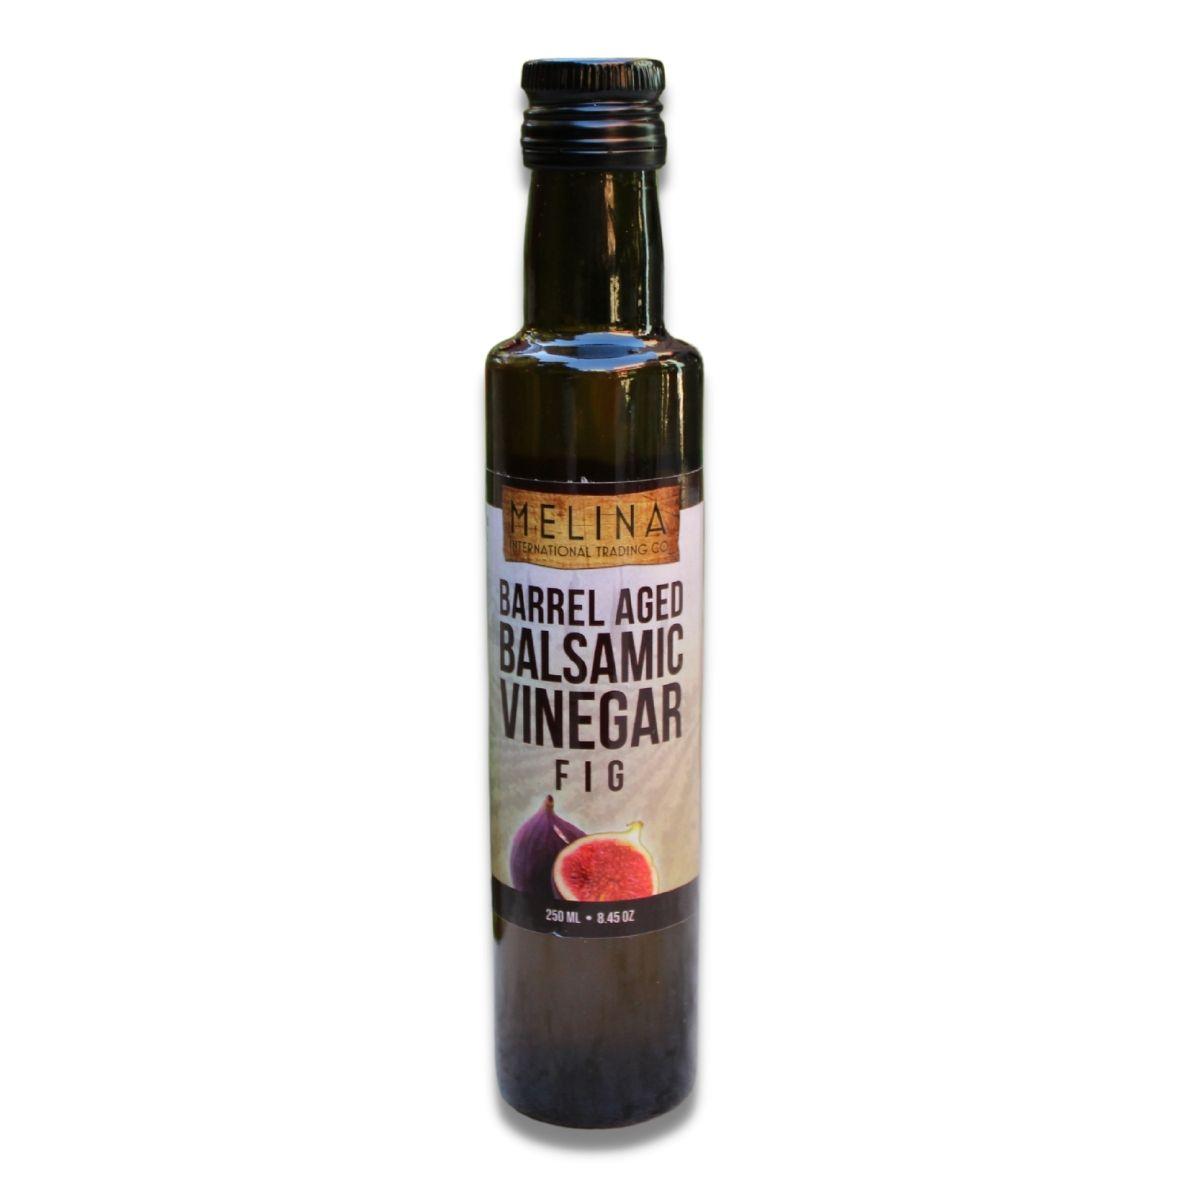 Melina Barrel Aged Fig Balsamic Vinegar